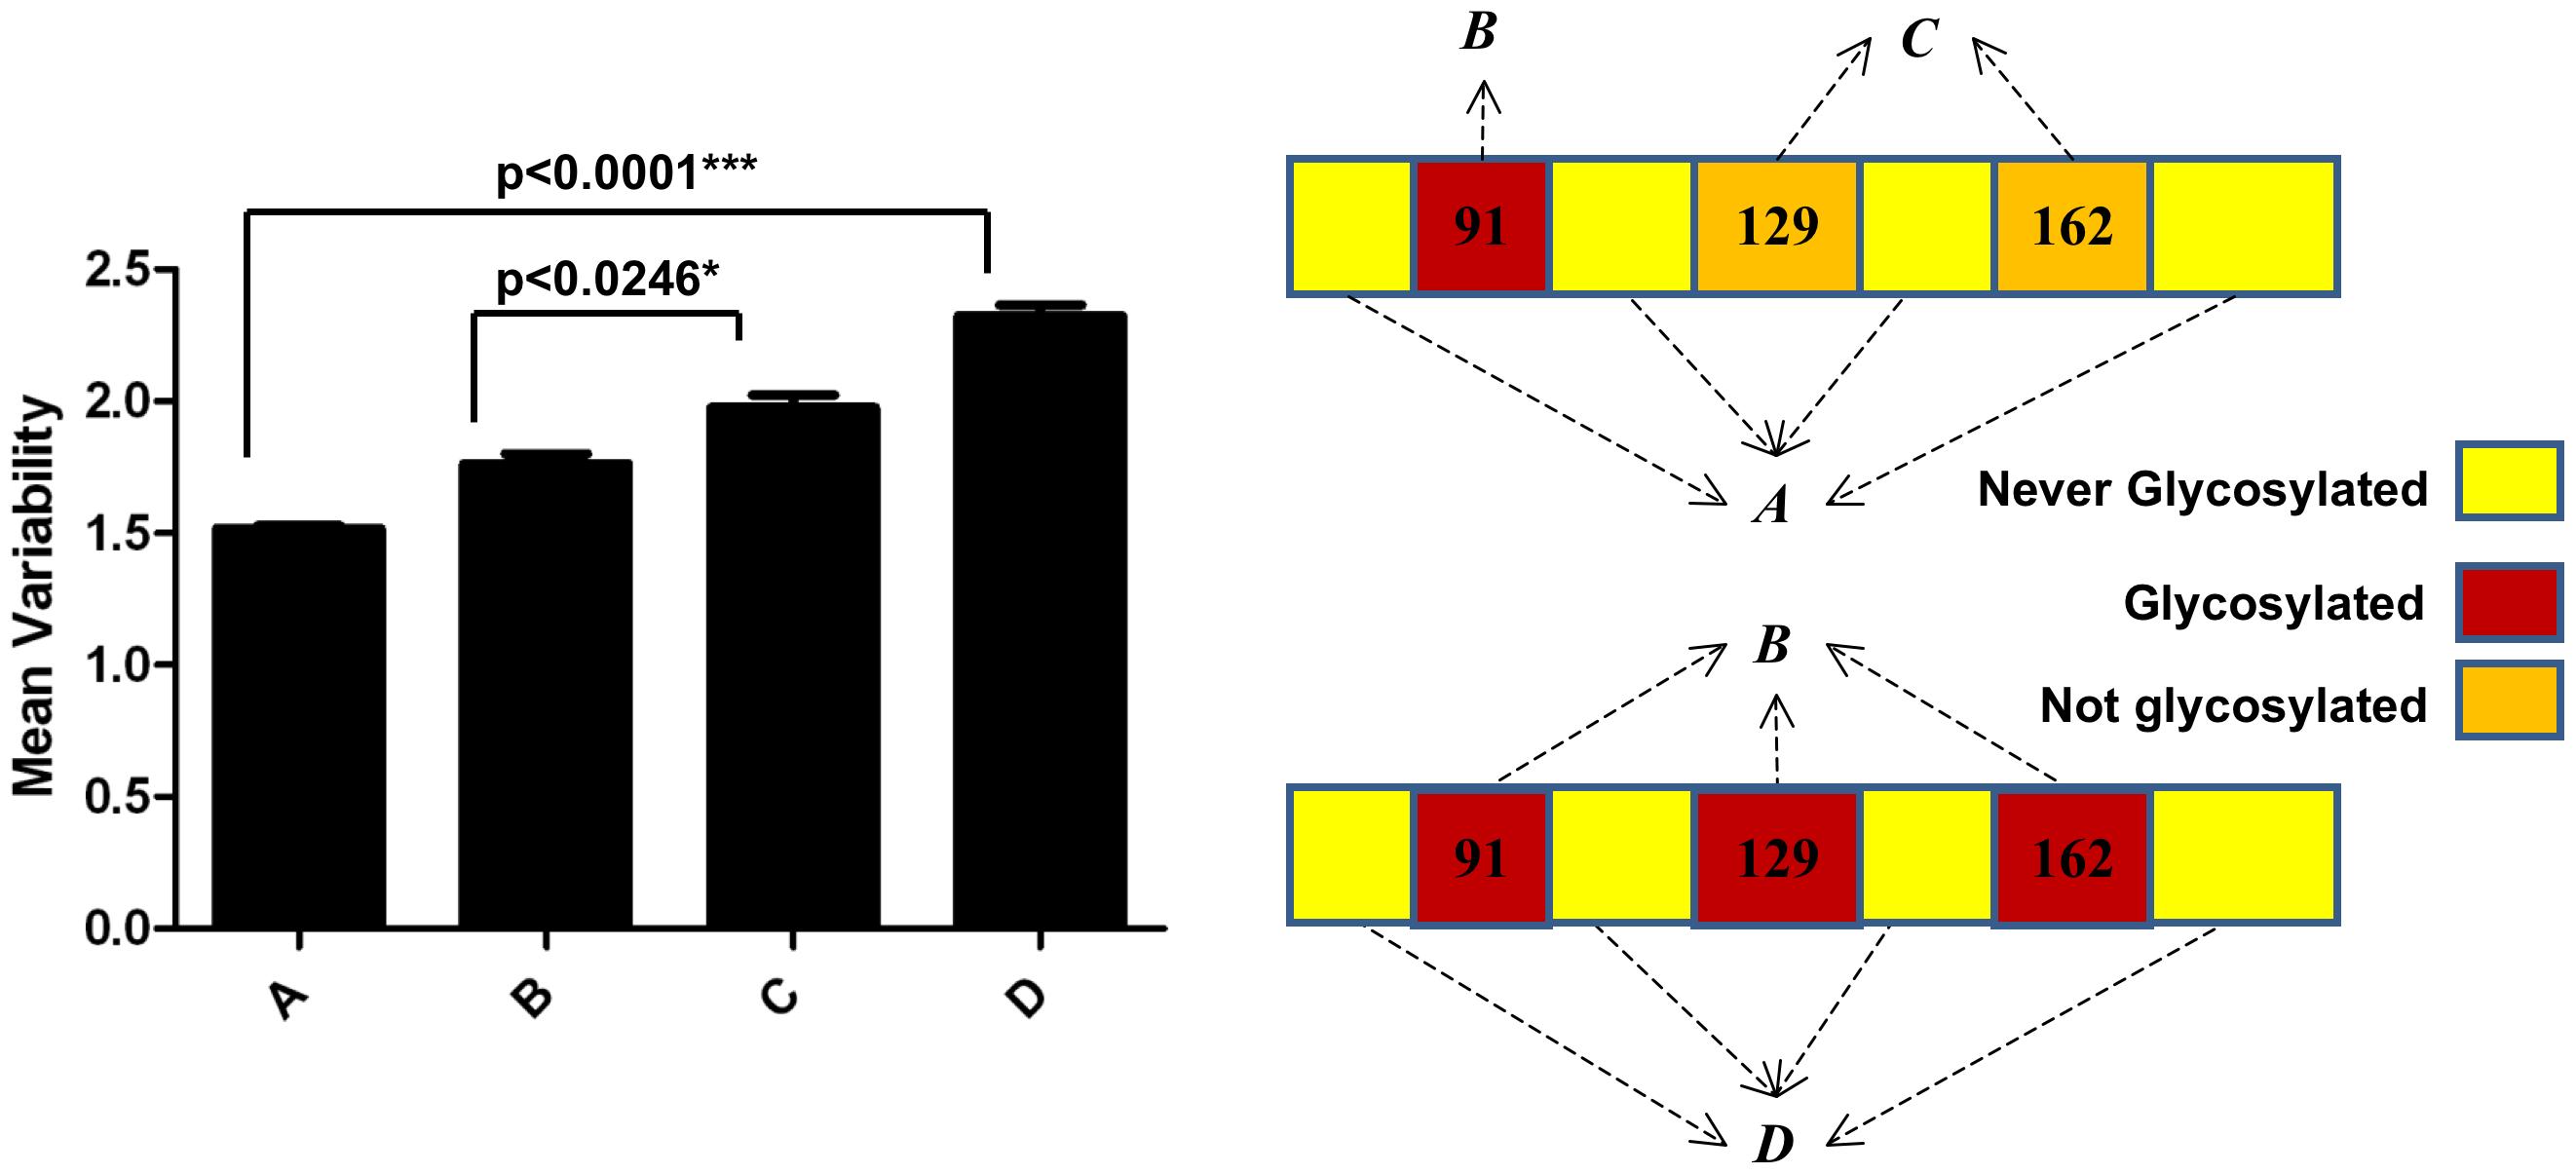 Mean values of variability of H1 globular domain.